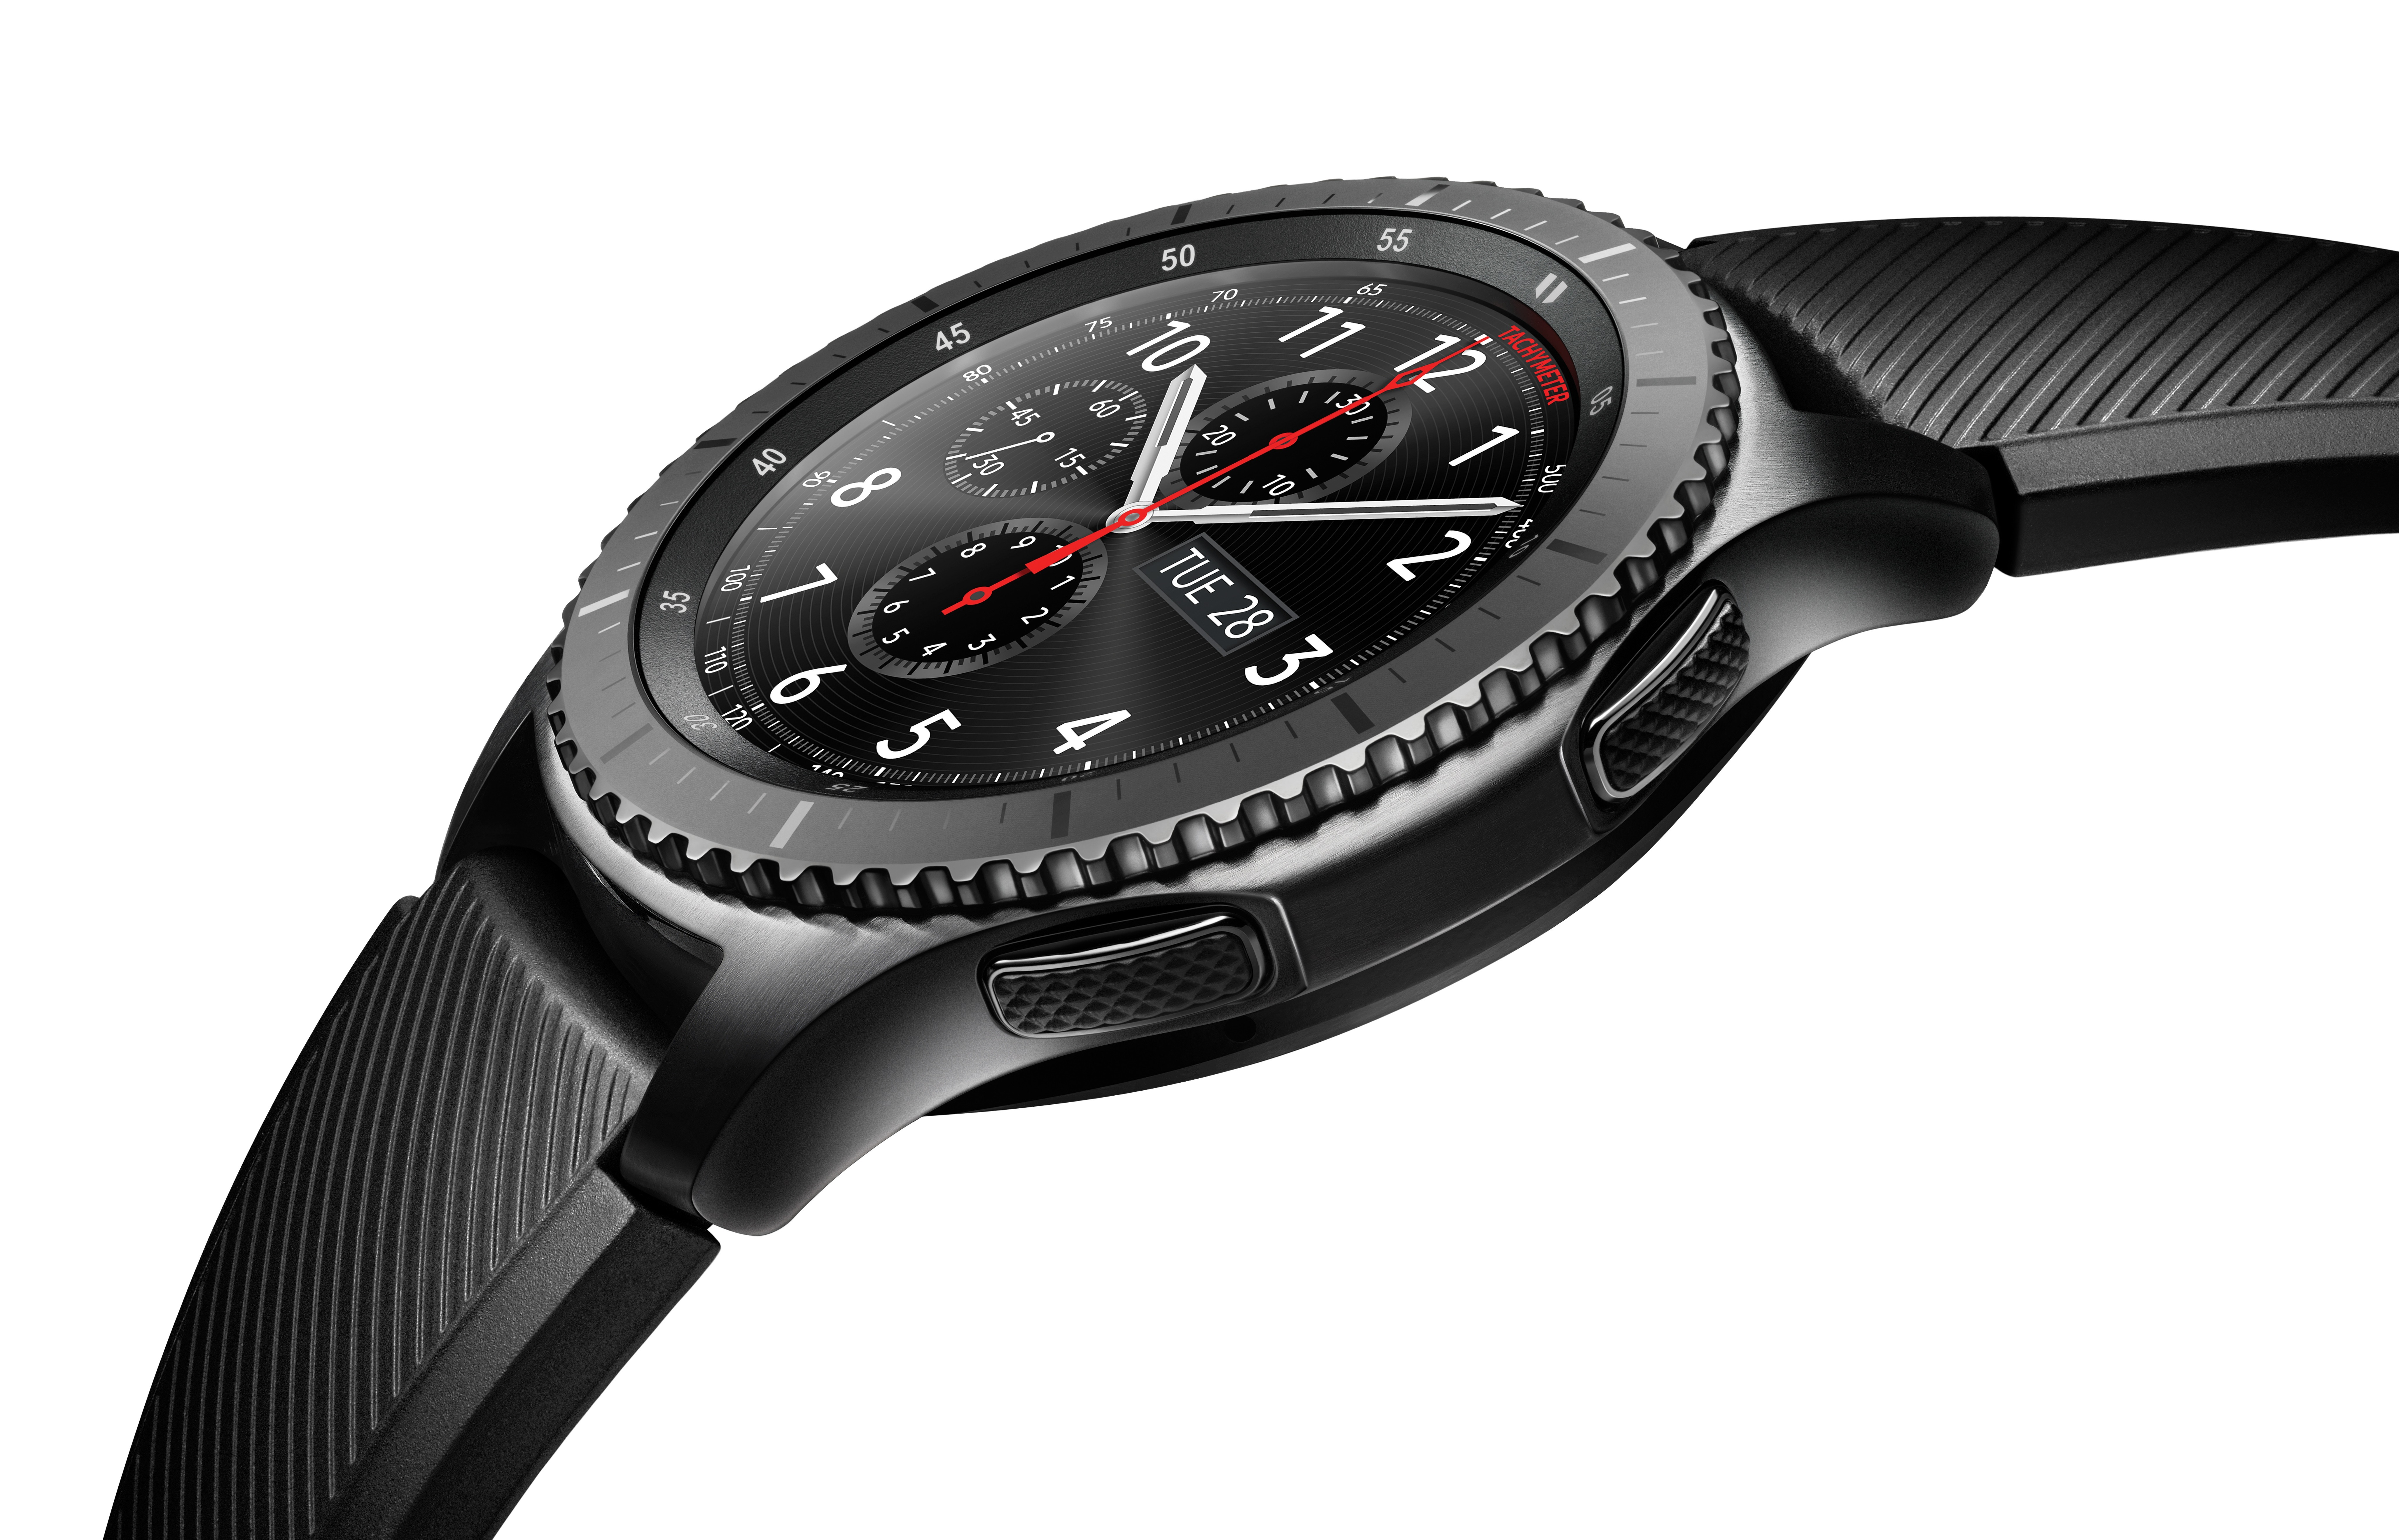 ADDING MULTIMEDIA Samsung Gear S3 Smartwatch Blends